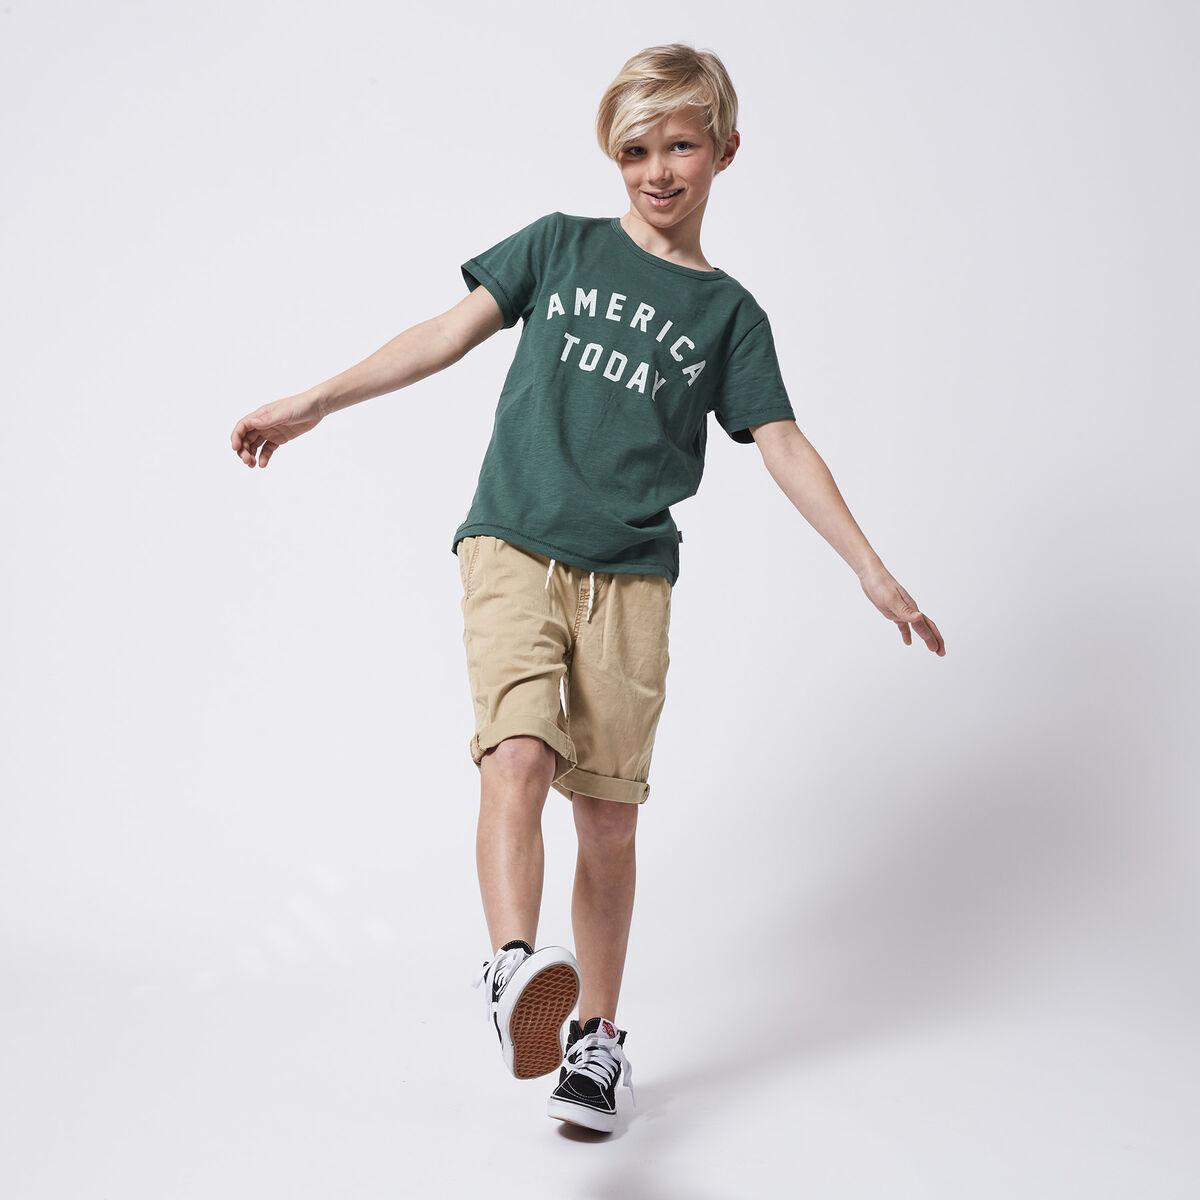 Short Nate Jr.